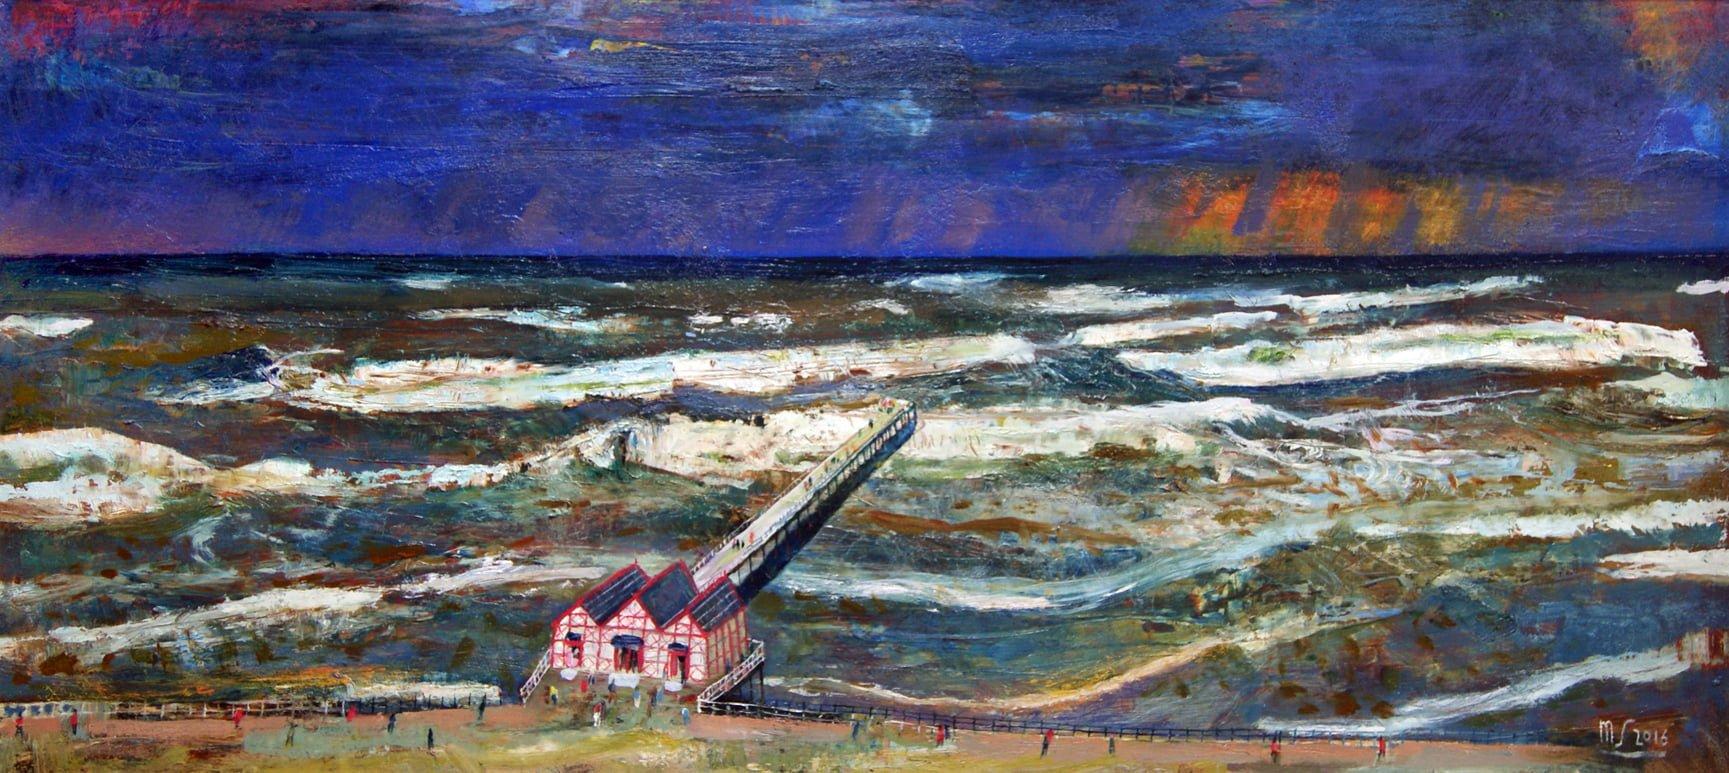 Stormy-Saltburn